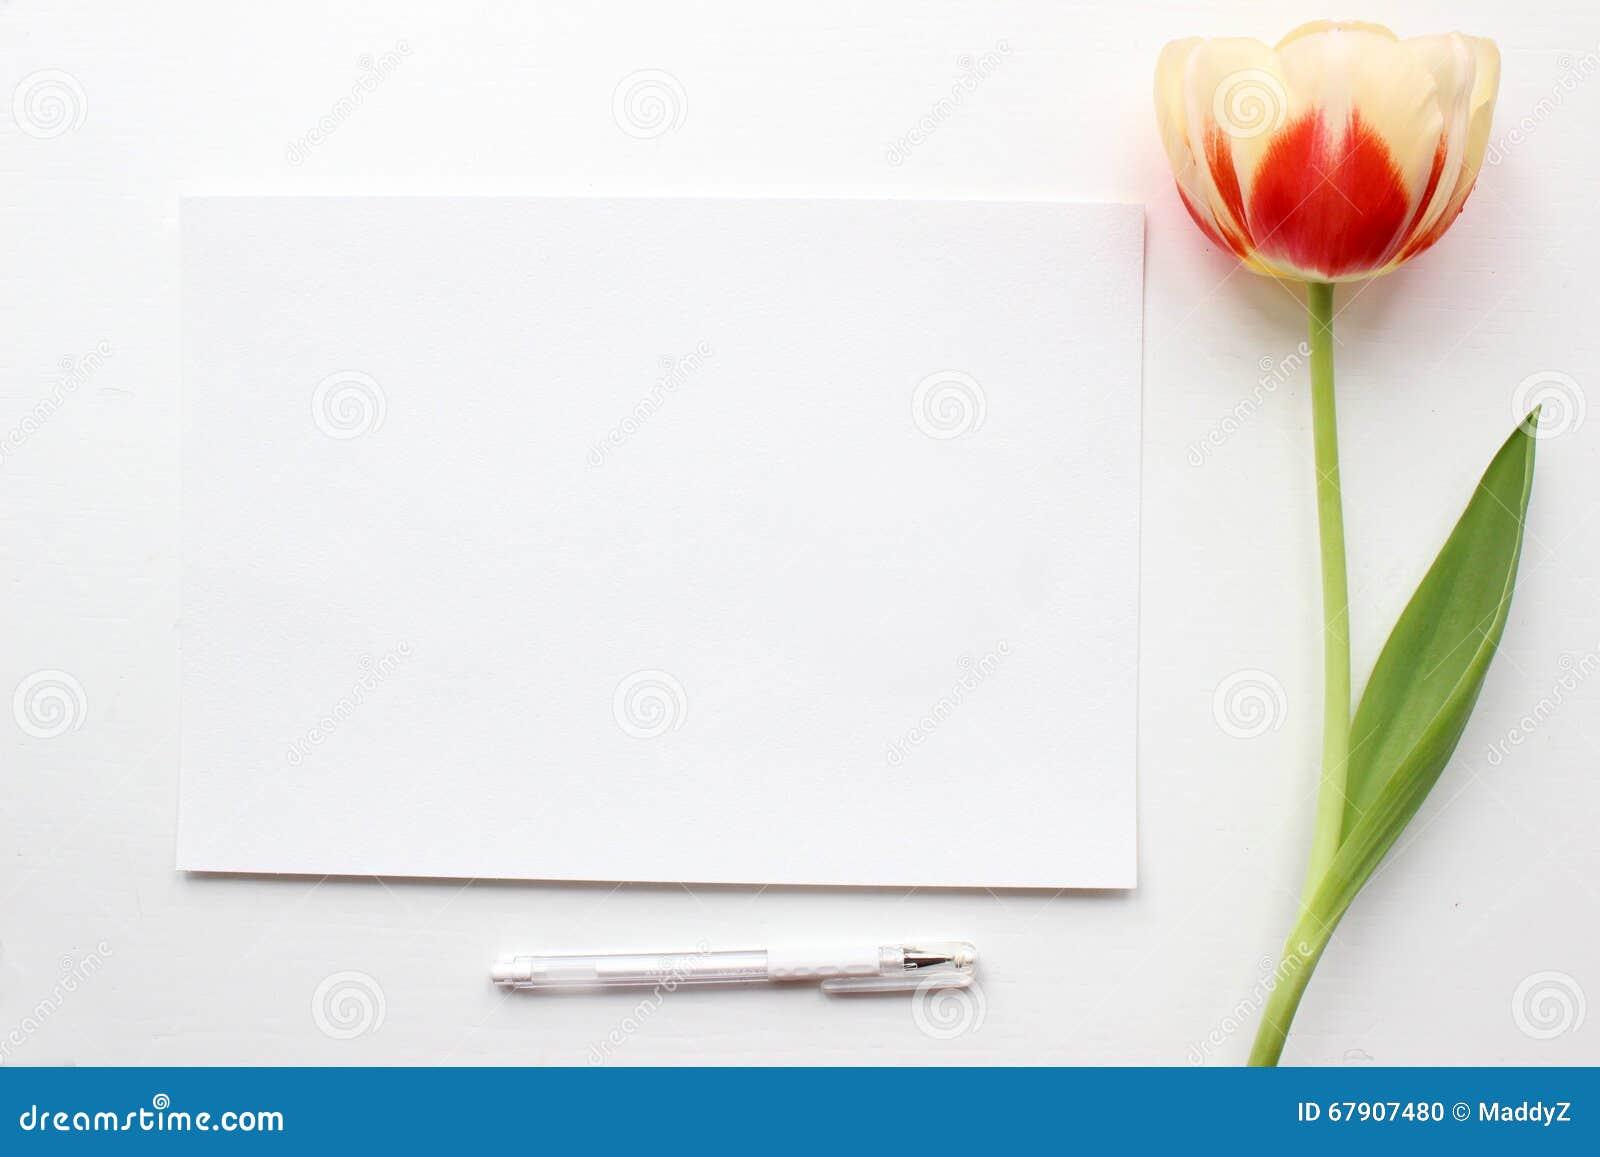 tulips mockup post blog social media stock photo image of paper